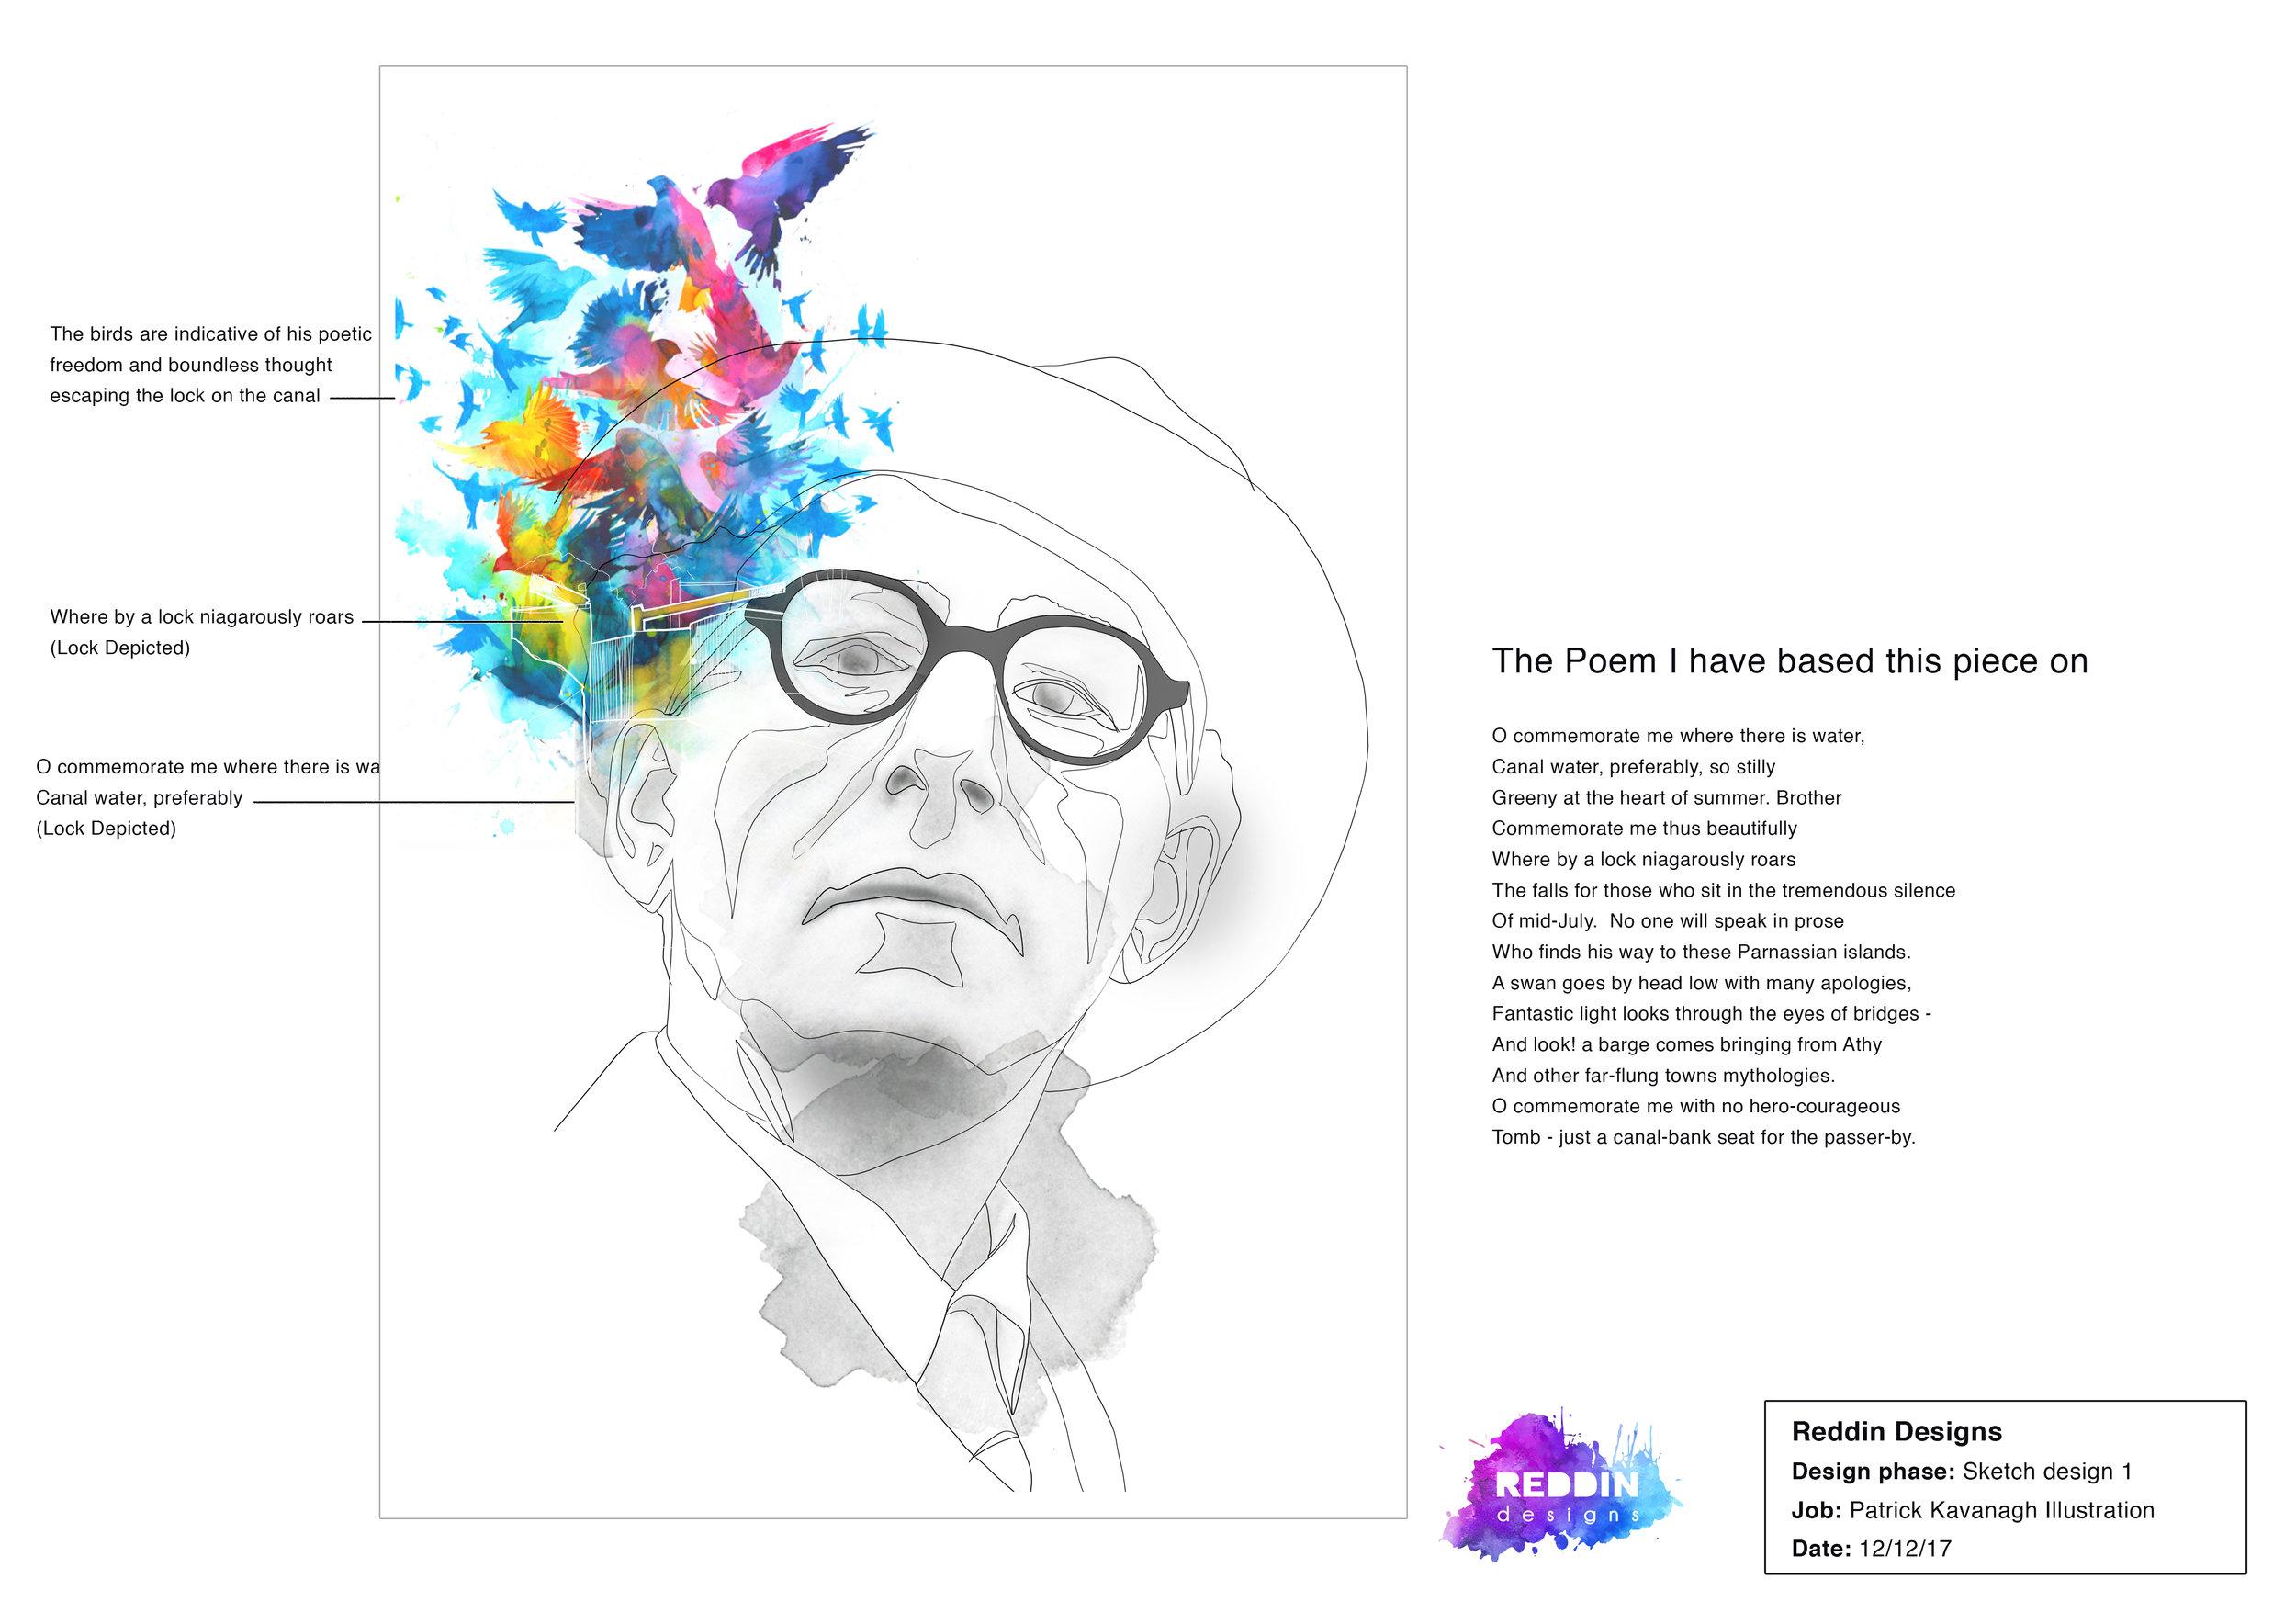 Reddin designs Patrick Kavanagh sketch design.jpg